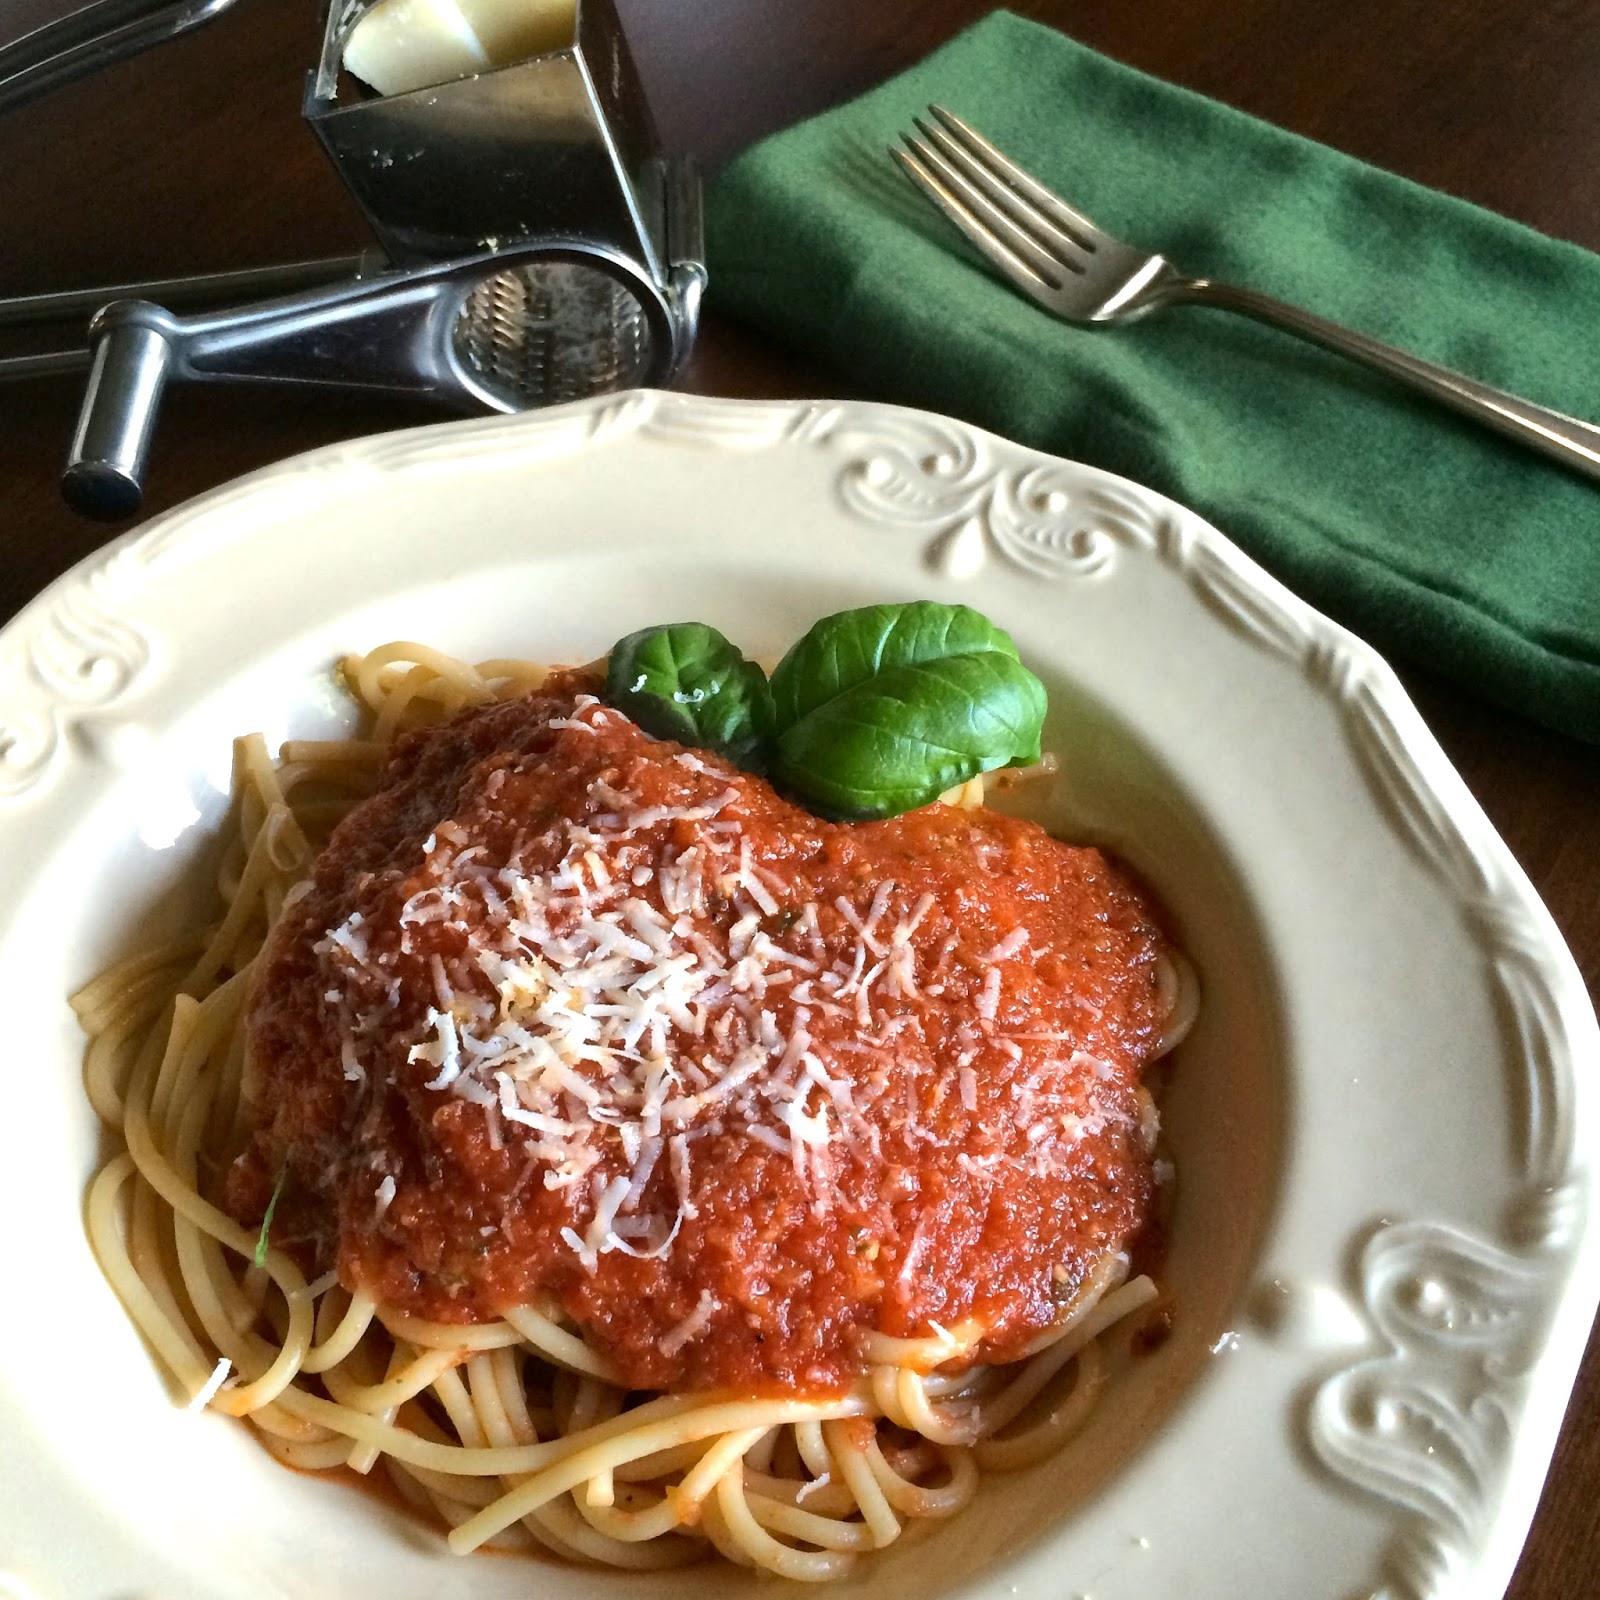 Food Impressions5 Minute Marinara Sauce